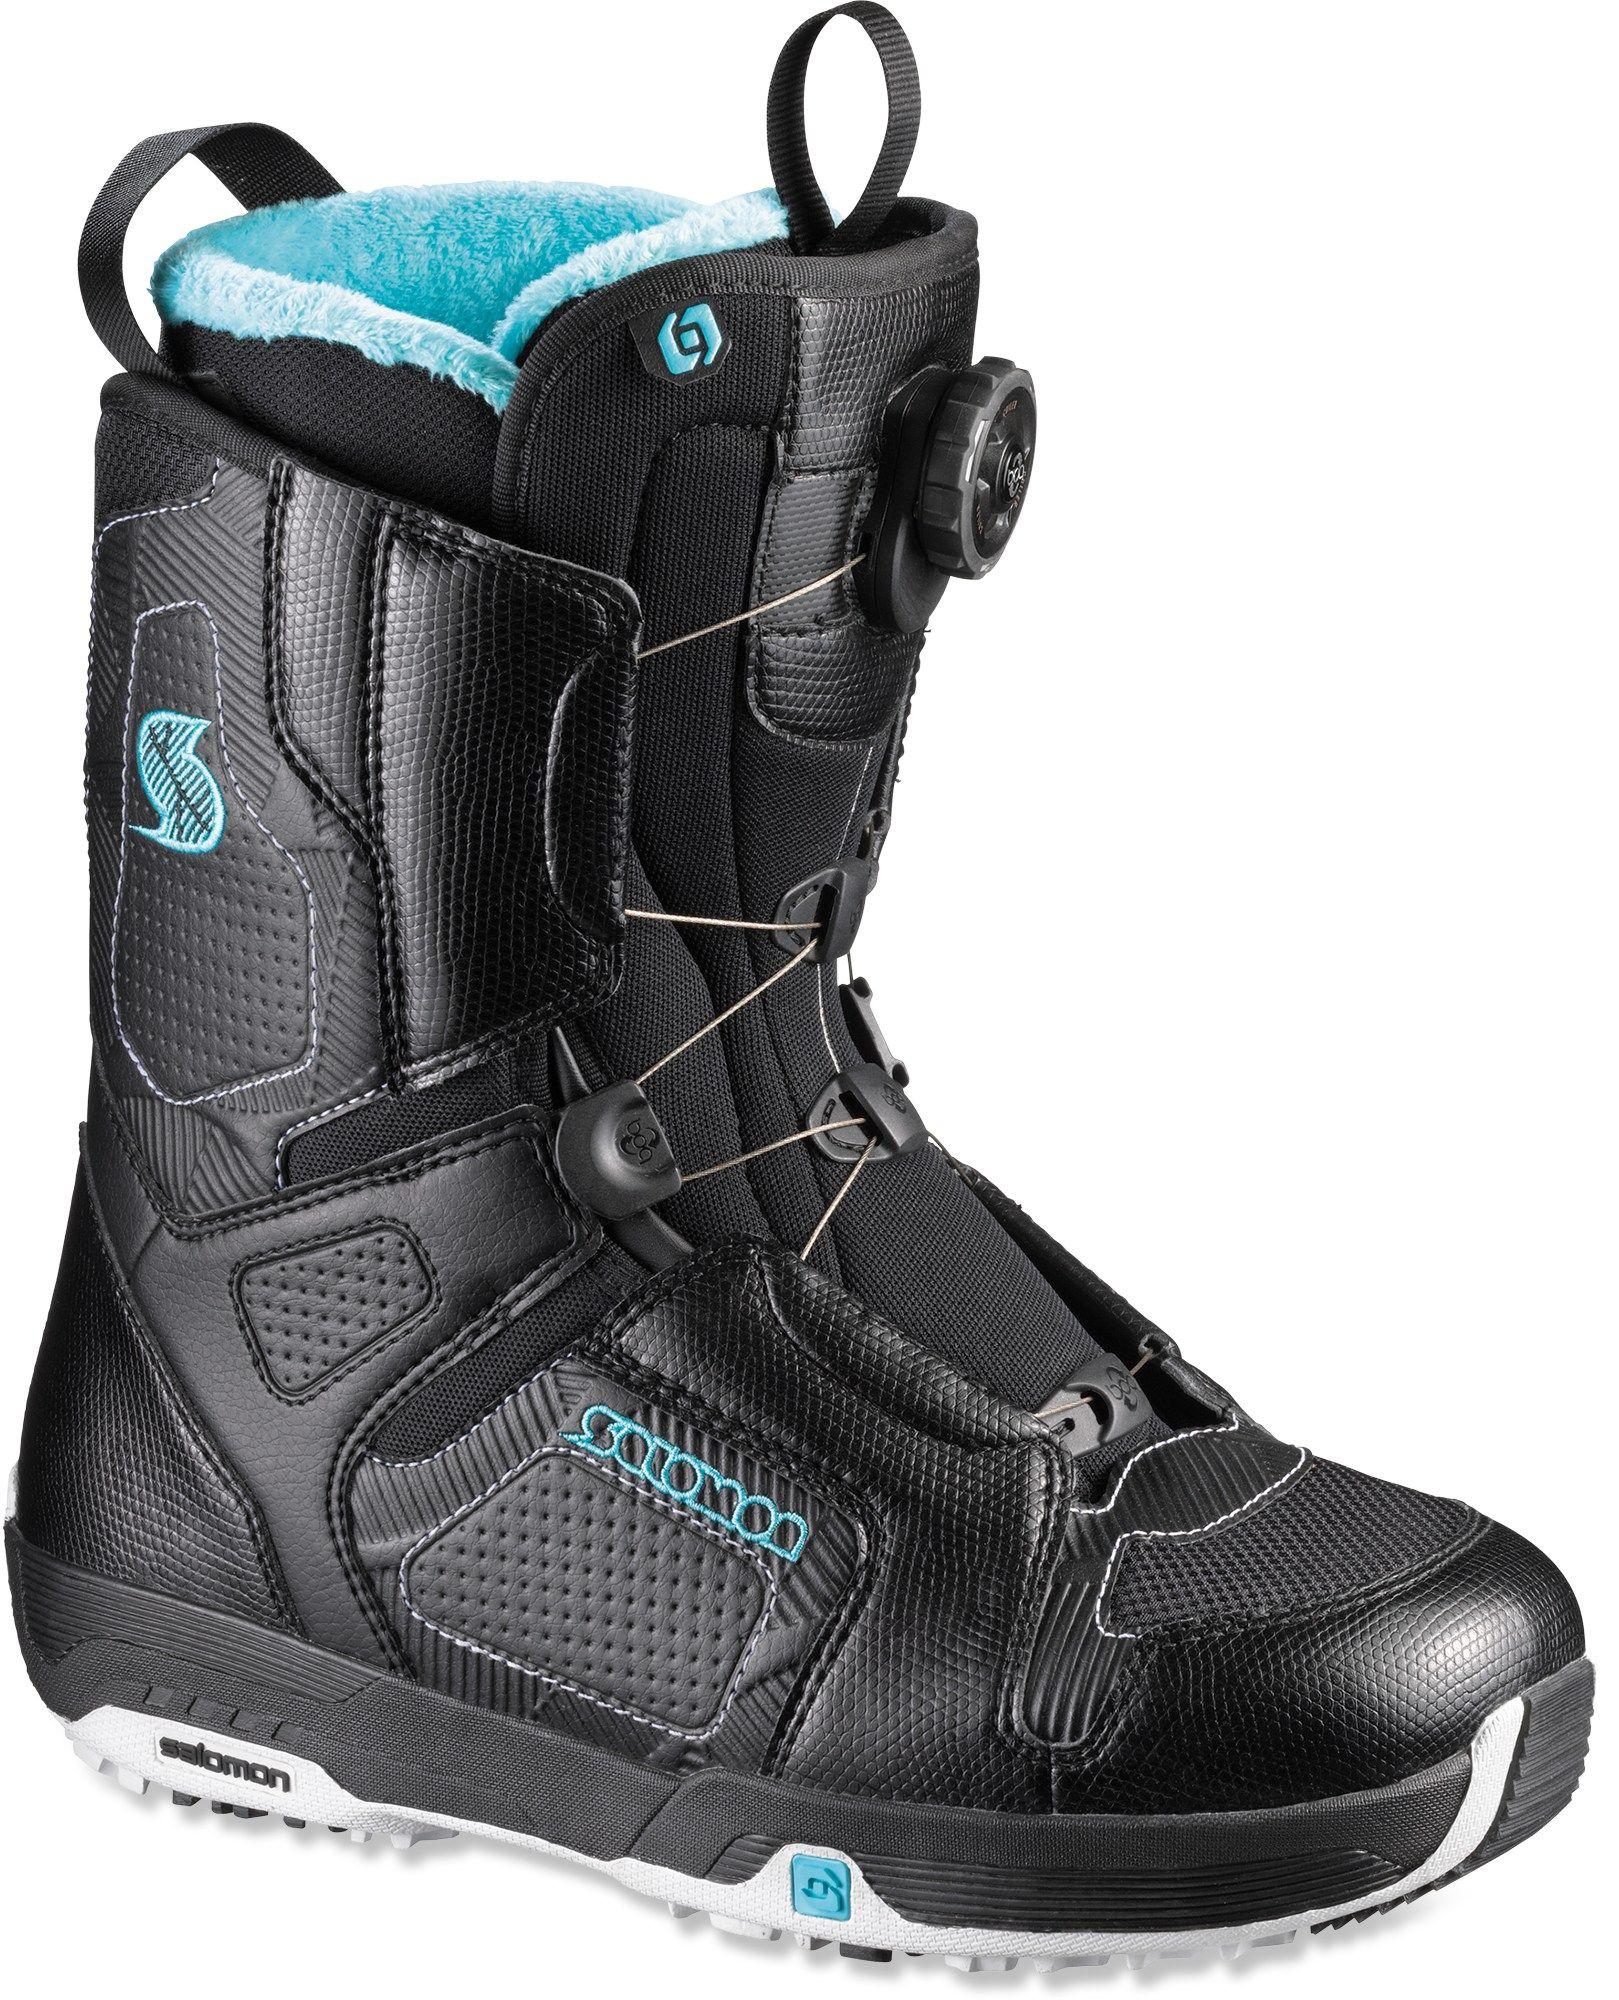 Salomon Pearl Boa Snowboard Boots Women S 2010 2011 Free Shipping At Rei Com Boots Snowboard Boots Womens Boots